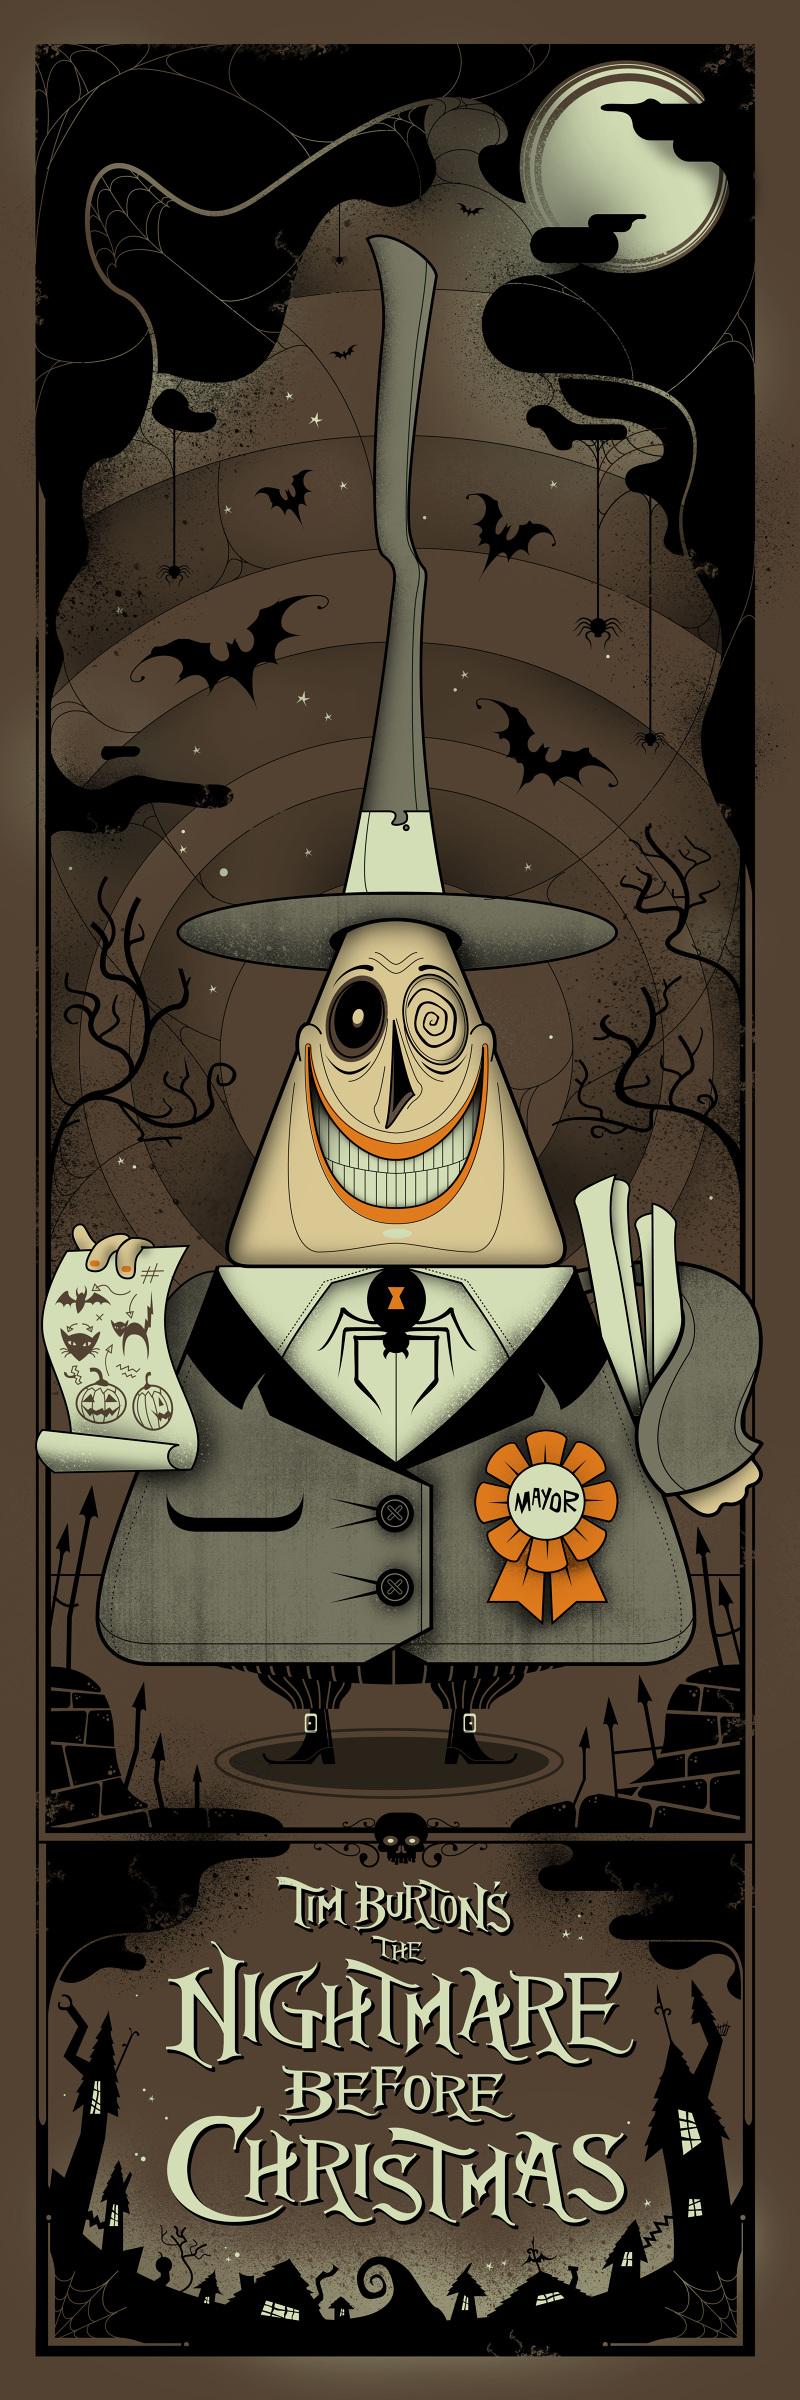 Nightmare Before Christmas: The Mayor - Graham Erwin ...